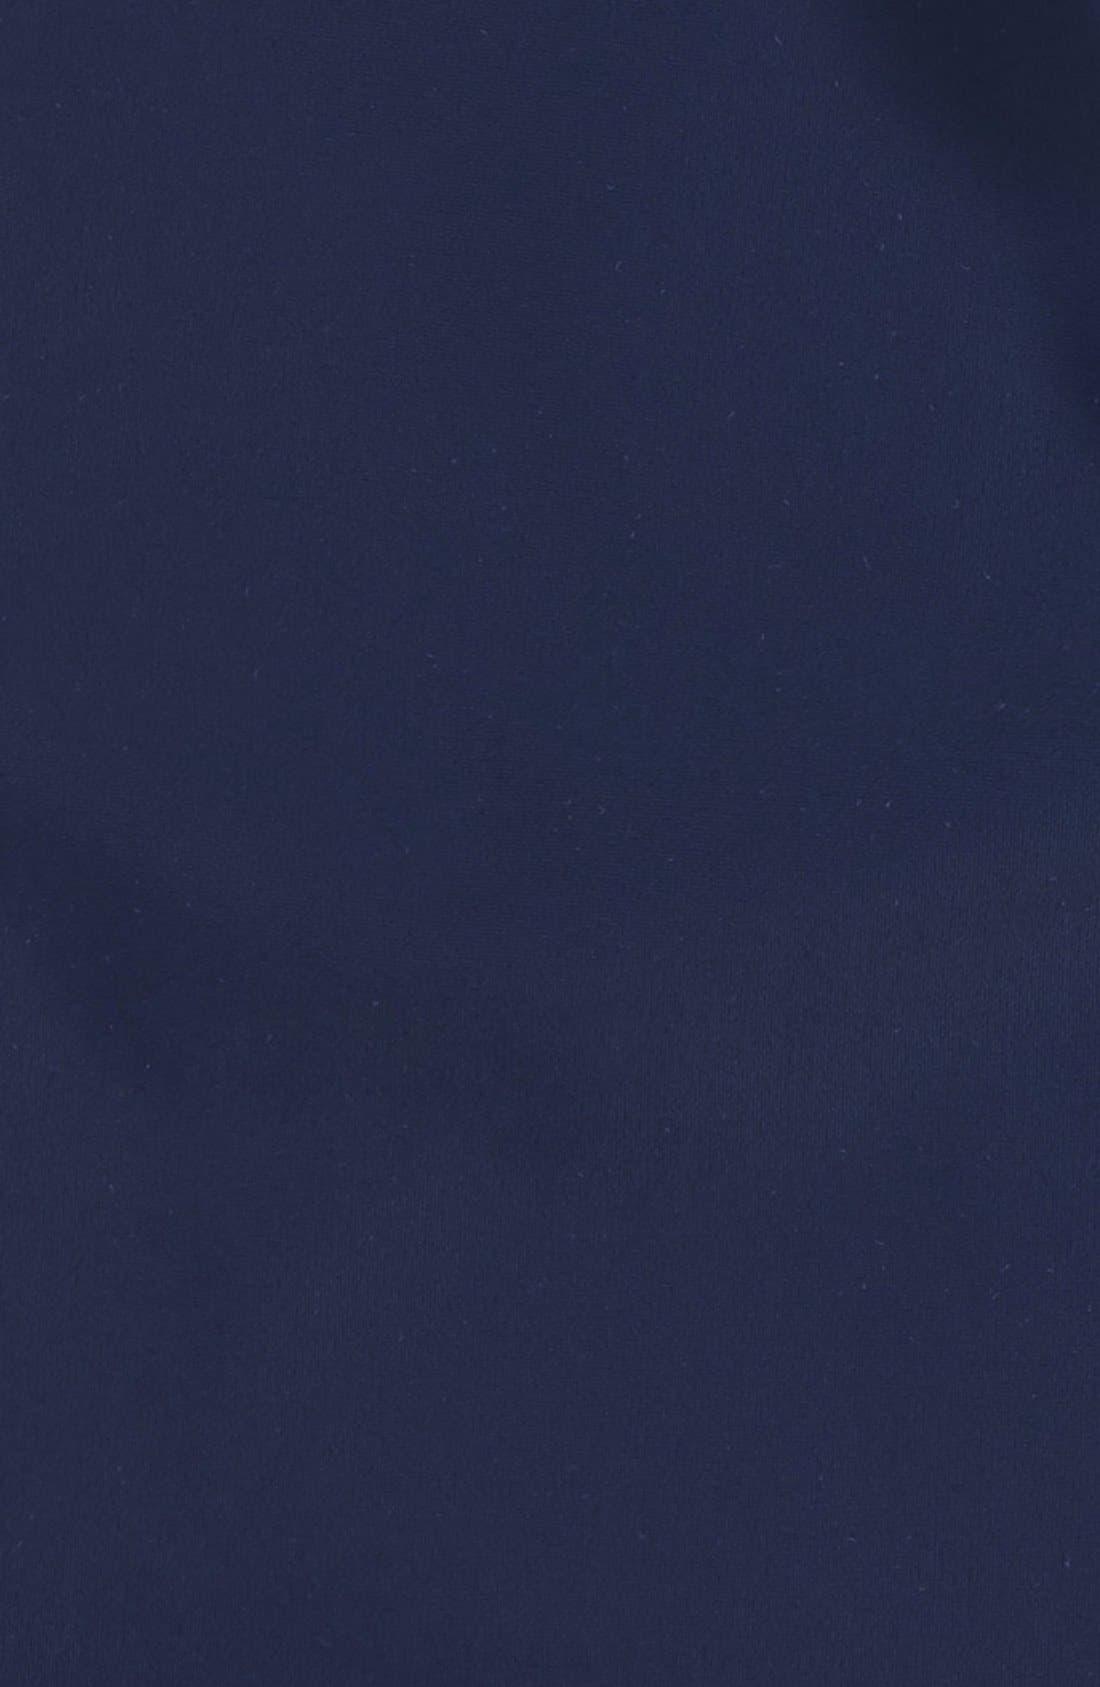 Alternate Image 2  - Burberry 'Beadnell' One-Piece Swimsuit (Little Girls & Big Girls)